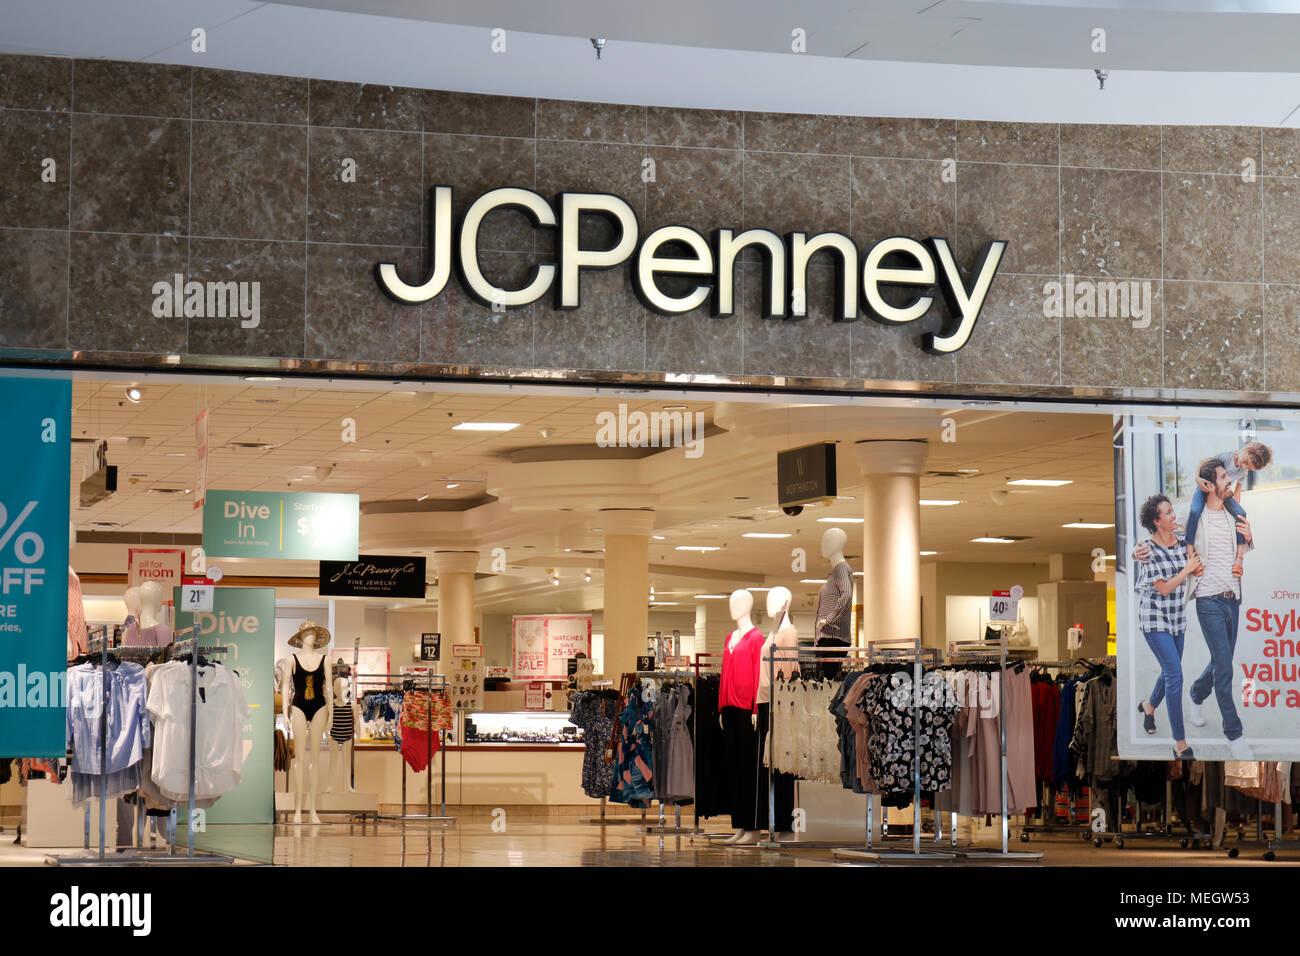 fe4b3c371196e Dayton - Circa April 2018  JC Penney Retail Mall Location. JCP is an Apparel